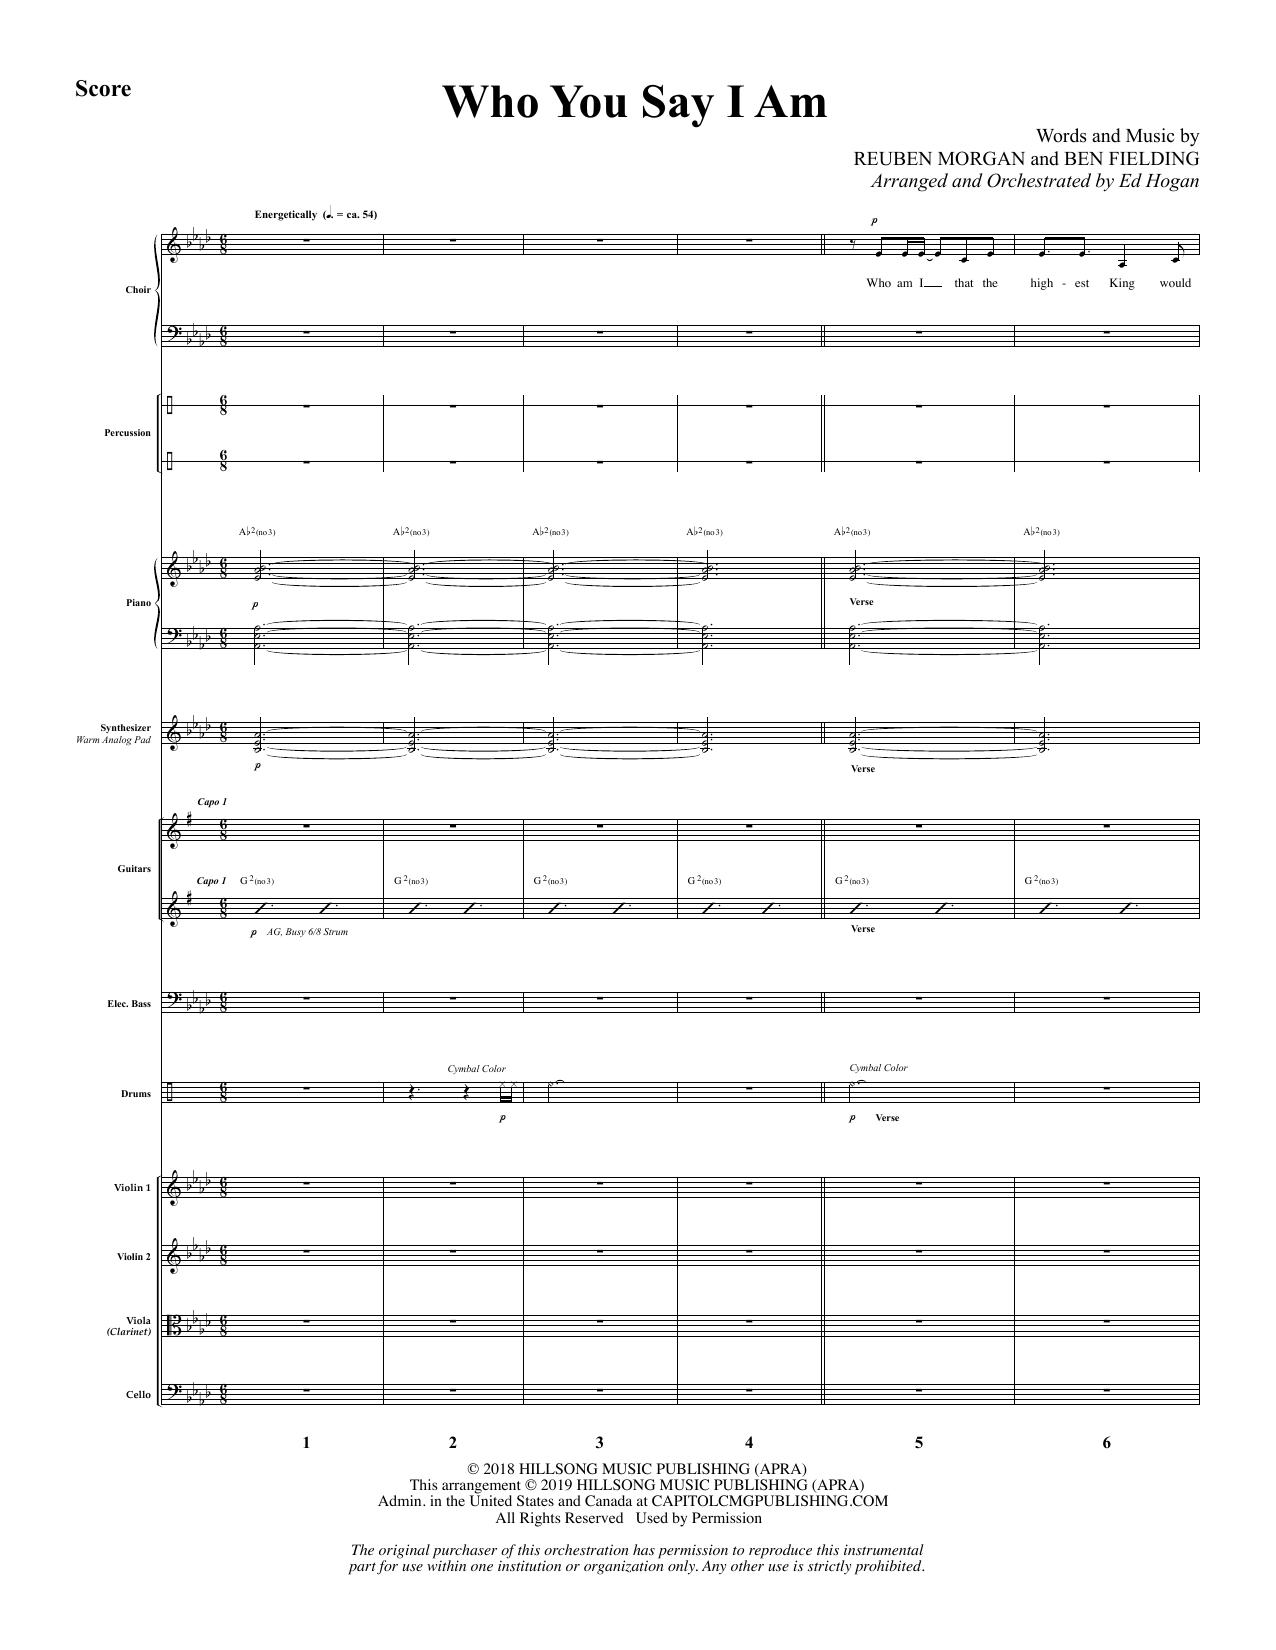 Who You Say I Am (arr. Ed Hogan) - Full Score Sheet Music